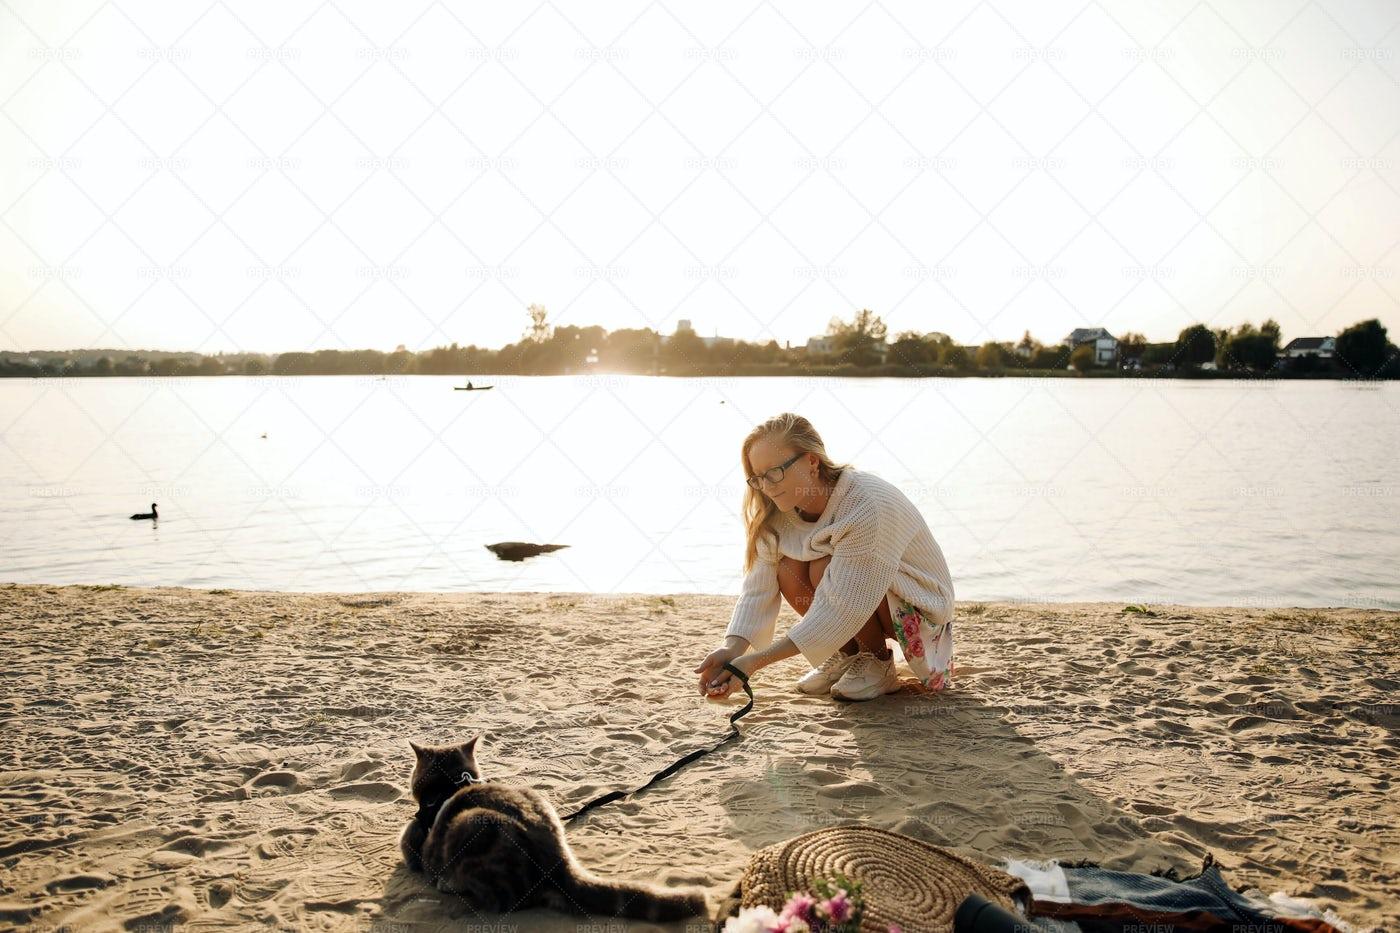 Woman Lying On Beach With Cat: Stock Photos